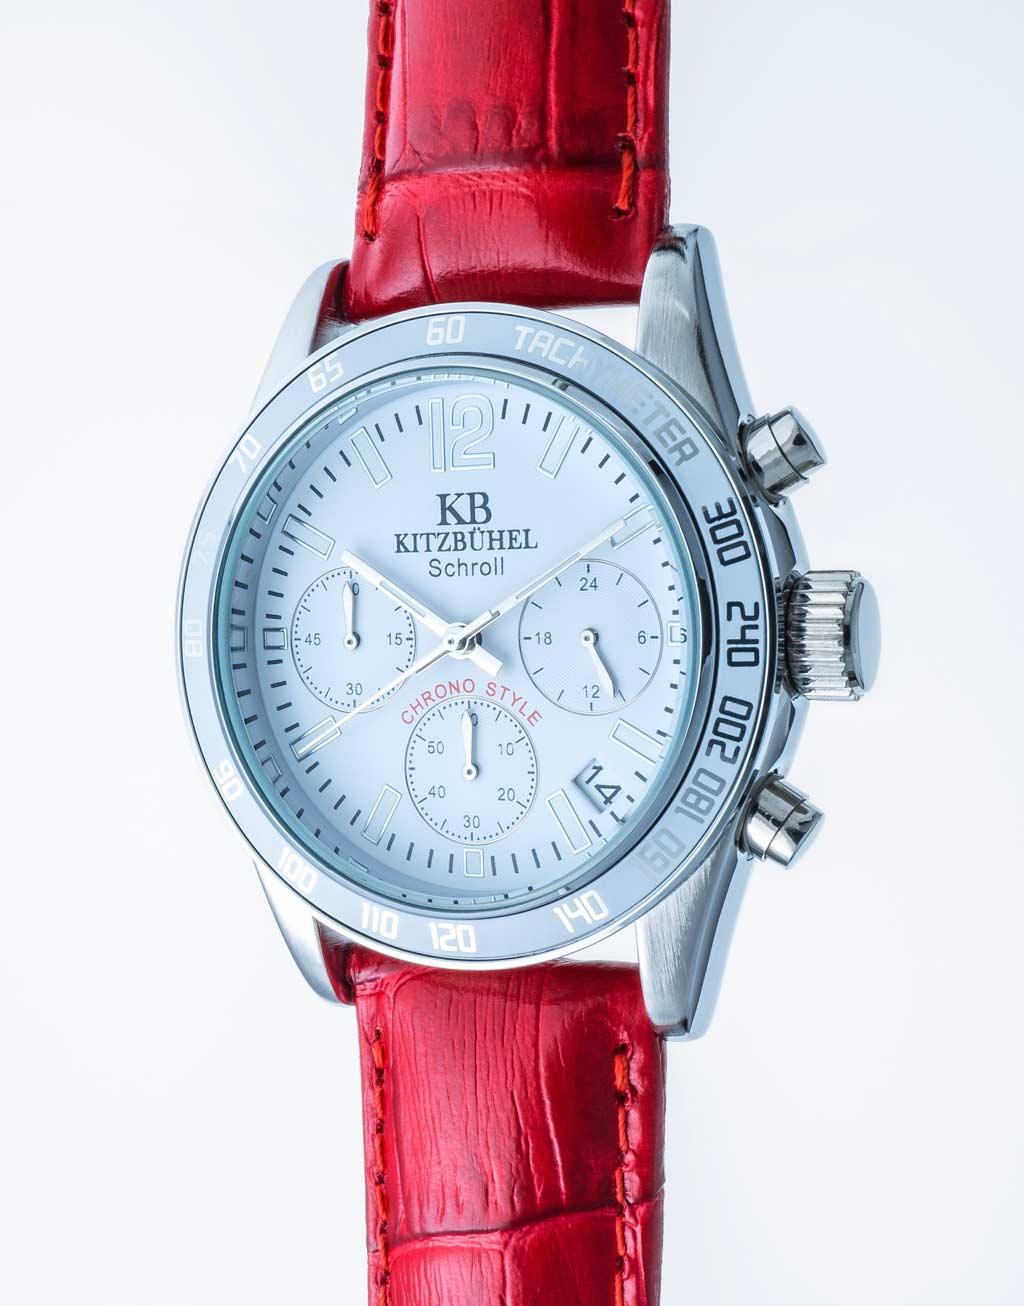 KB Watch – Chrono Style